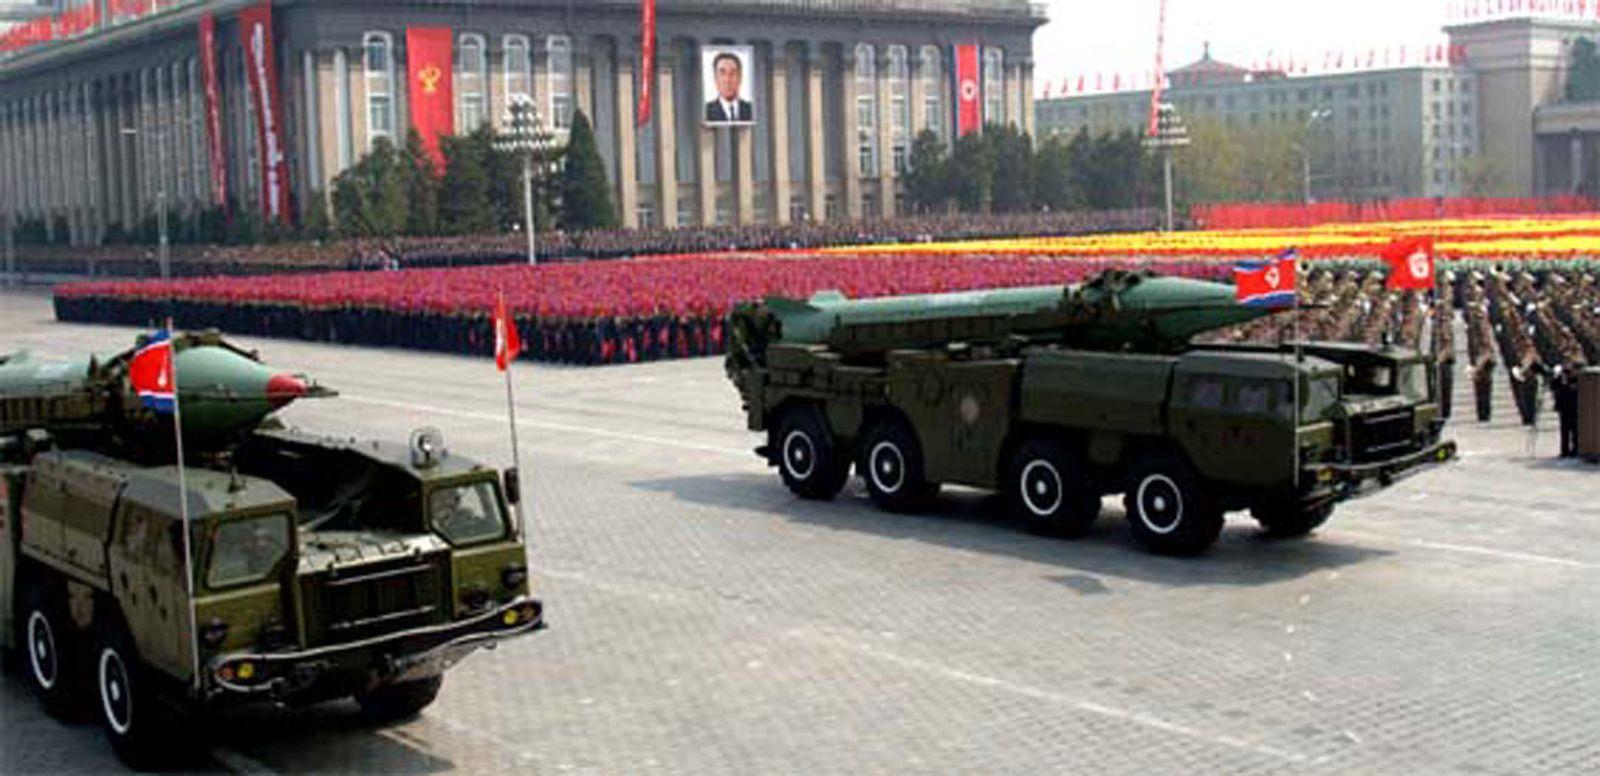 Nordkorea / Militärparade / Rakete